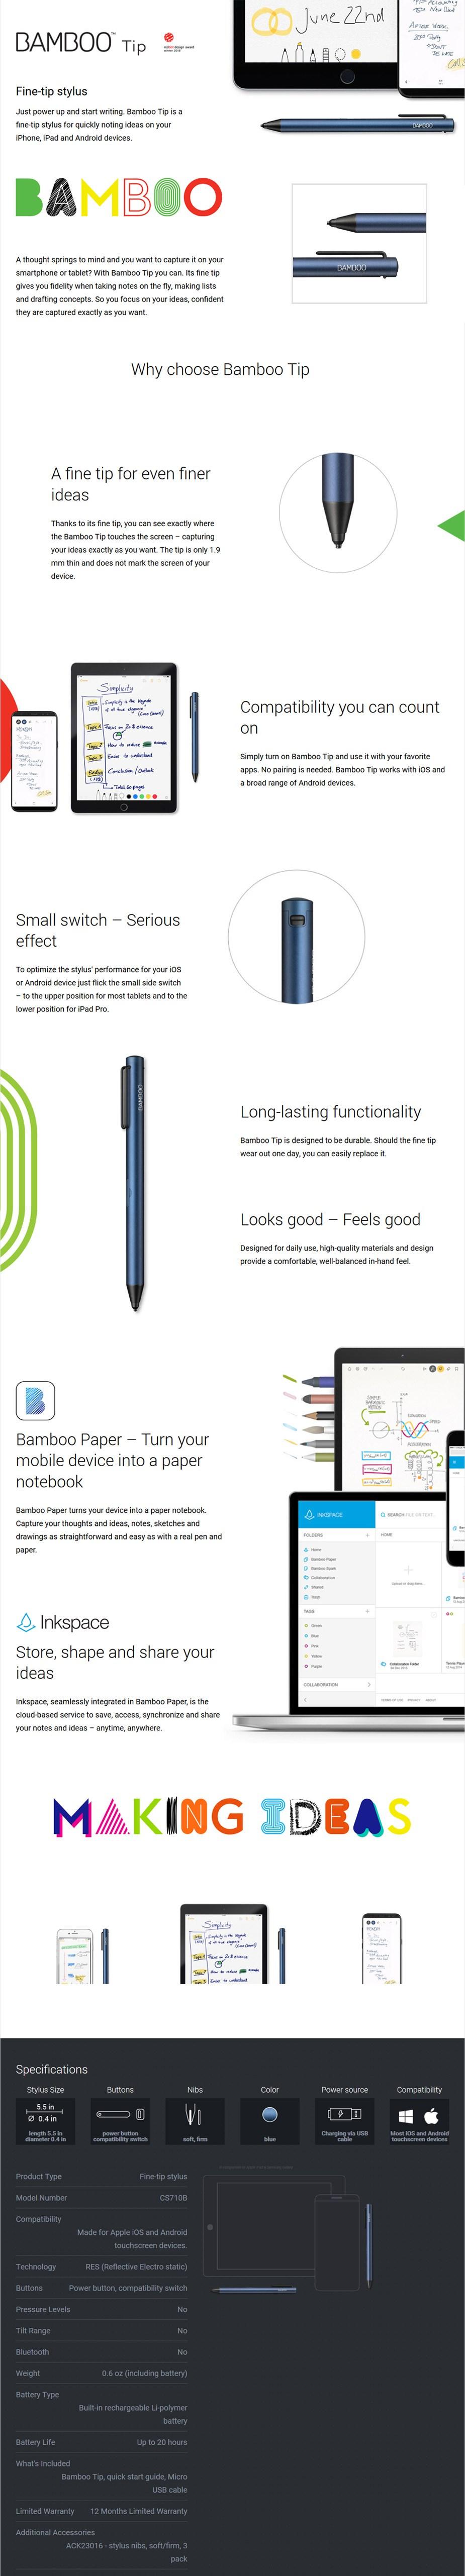 Wacom Bamboo Tip Stylus - Desktop Overview 1